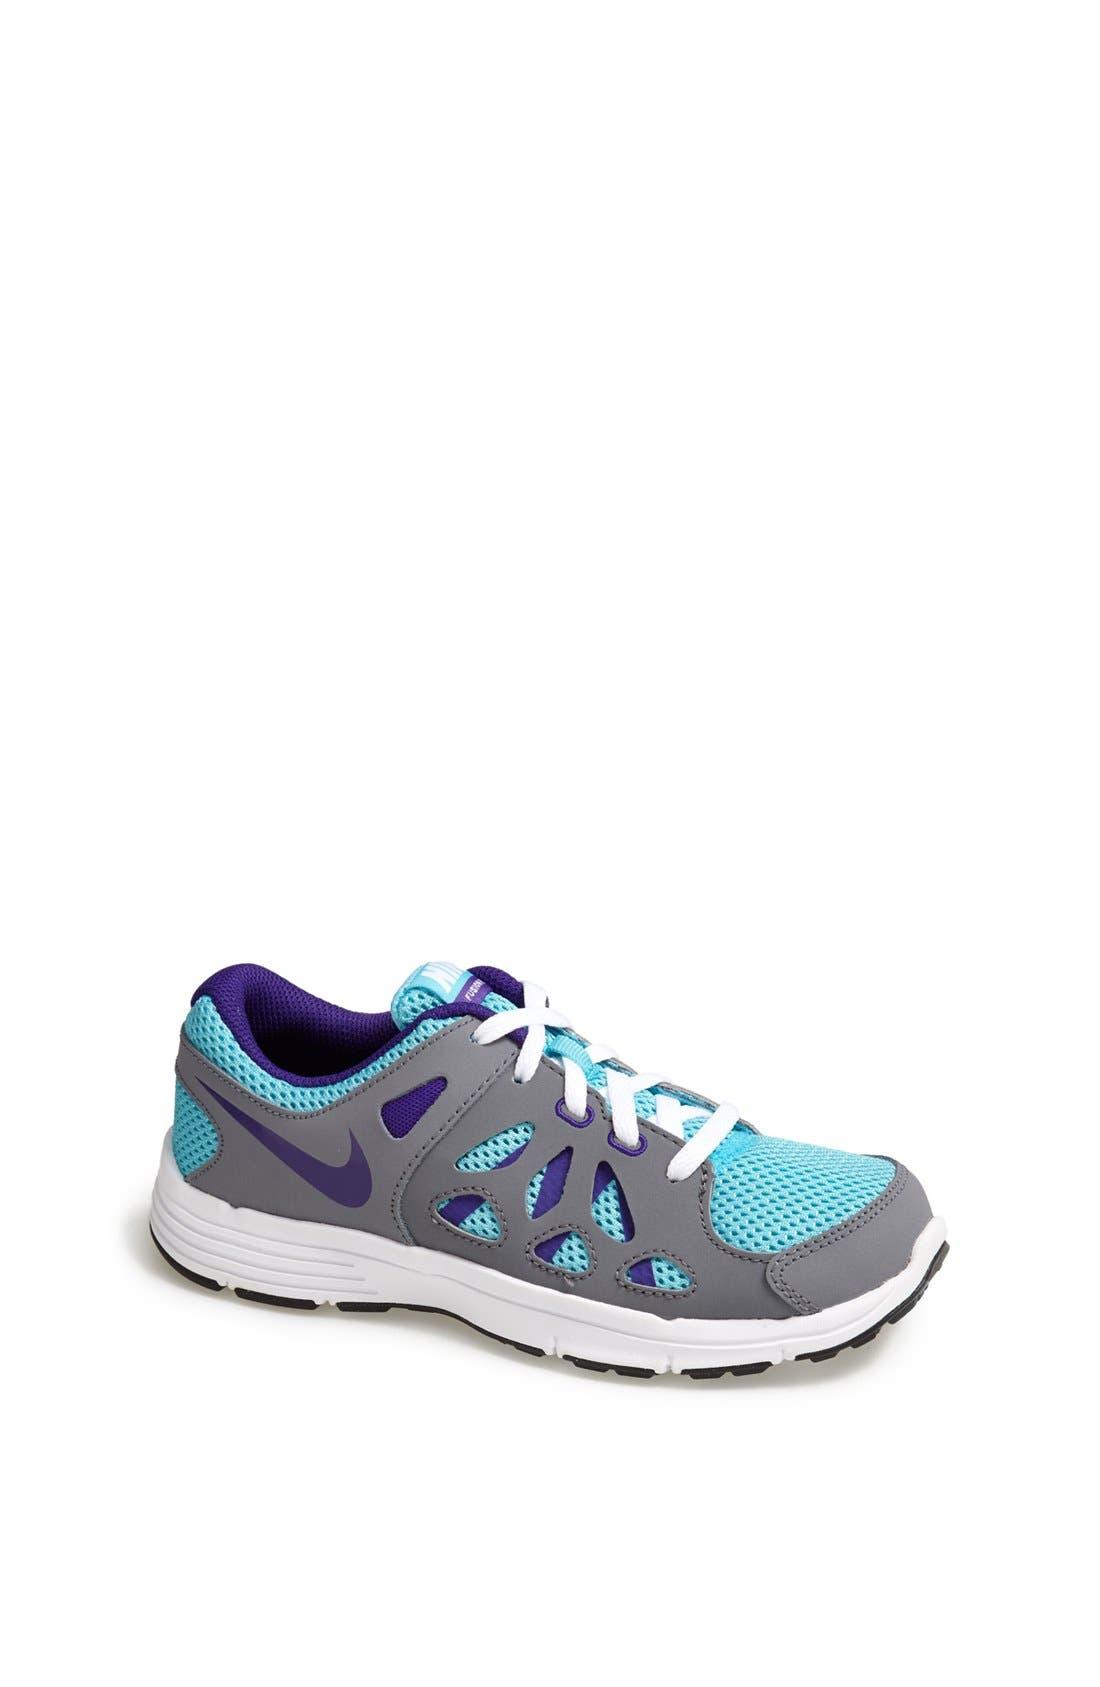 Main Image - Nike 'Fusion Run' Athletic Shoe (Toddler & Little Kid)